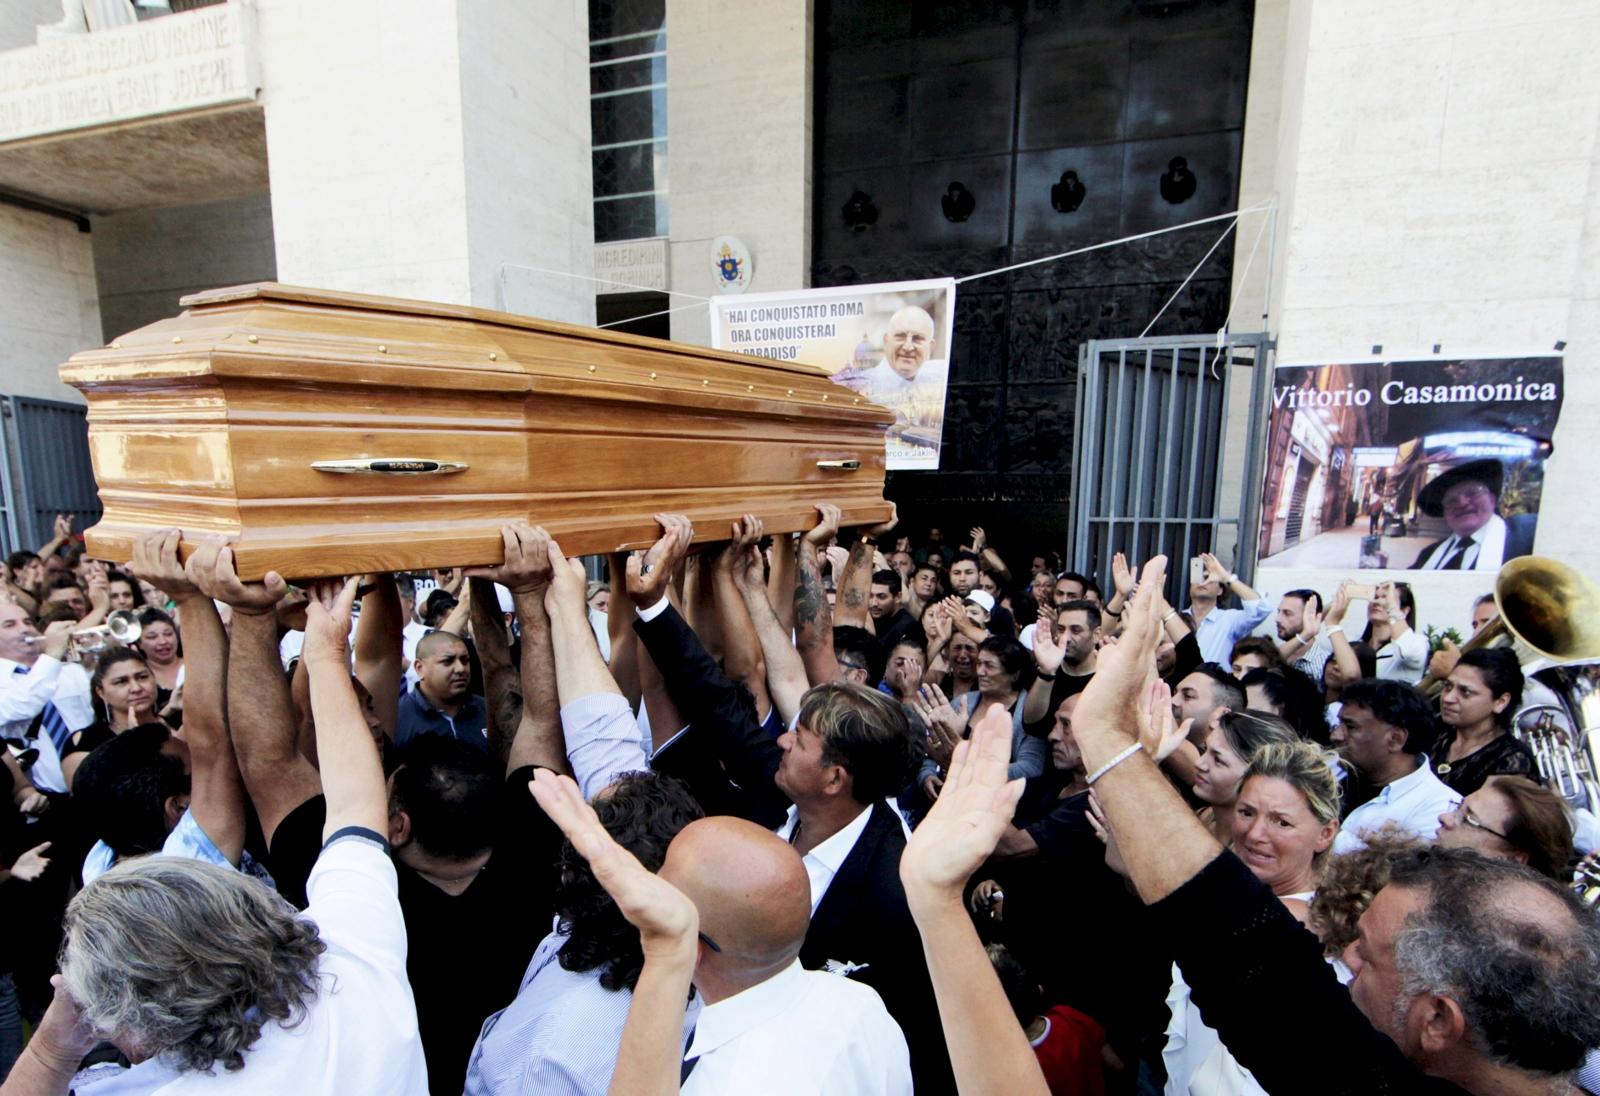 Vittorio Casamonica funeral